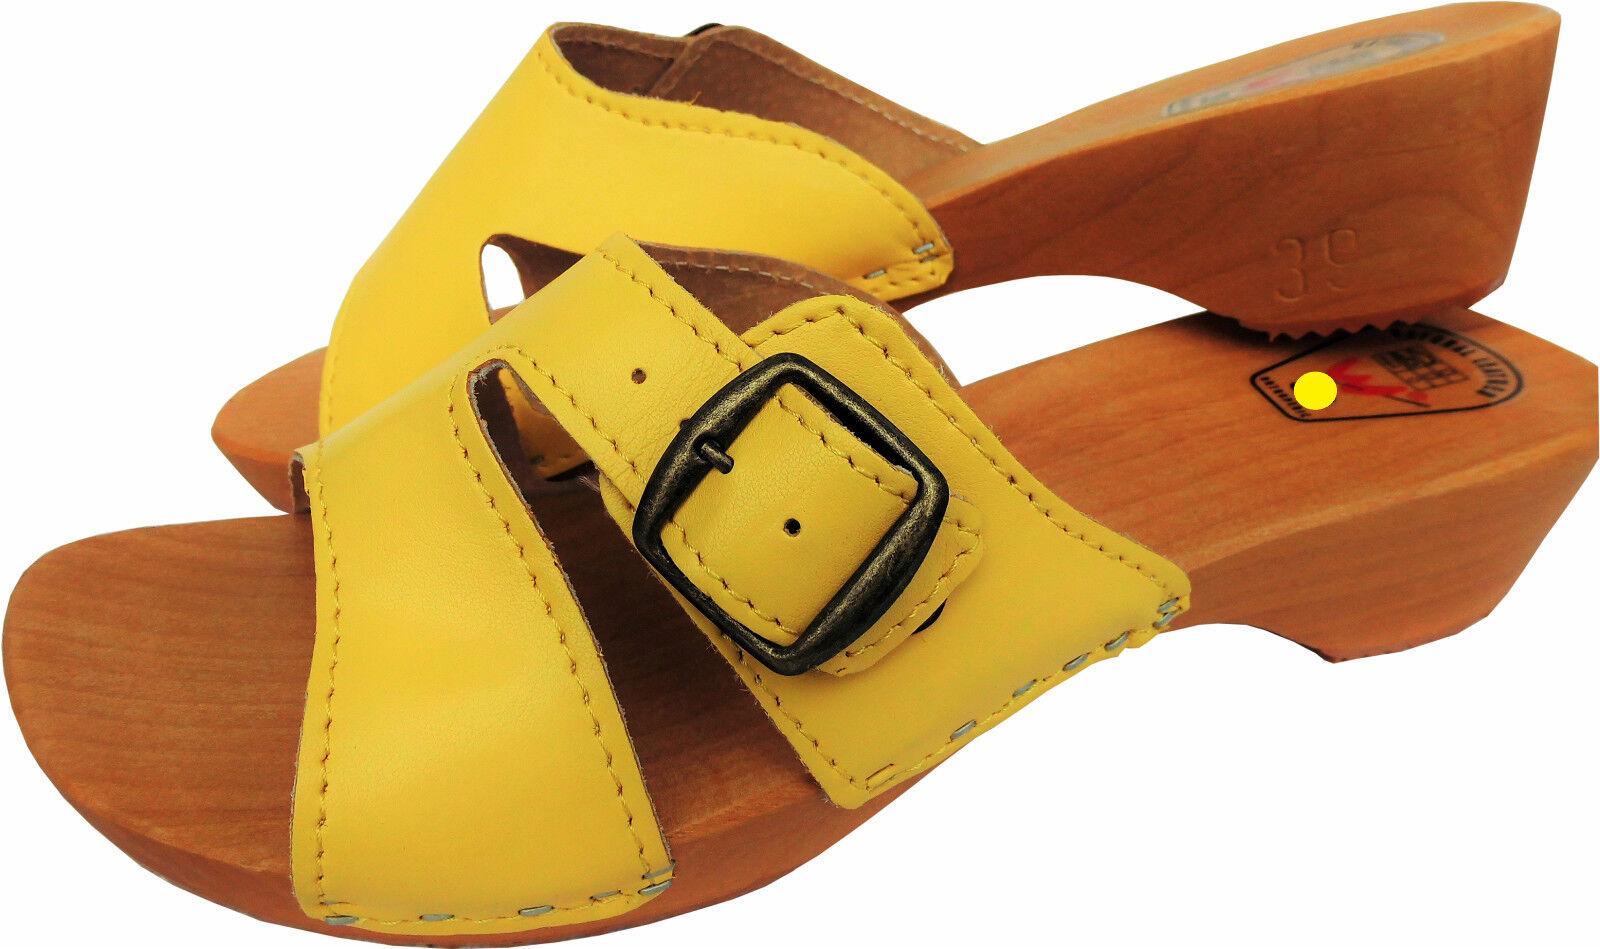 HOLZ (e) CLOGS  Holz Pantolette Gr.37 Echt 10-4-4-76) Leder, GELB (Madein Poland 10-4-4-76) Echt 3a1874